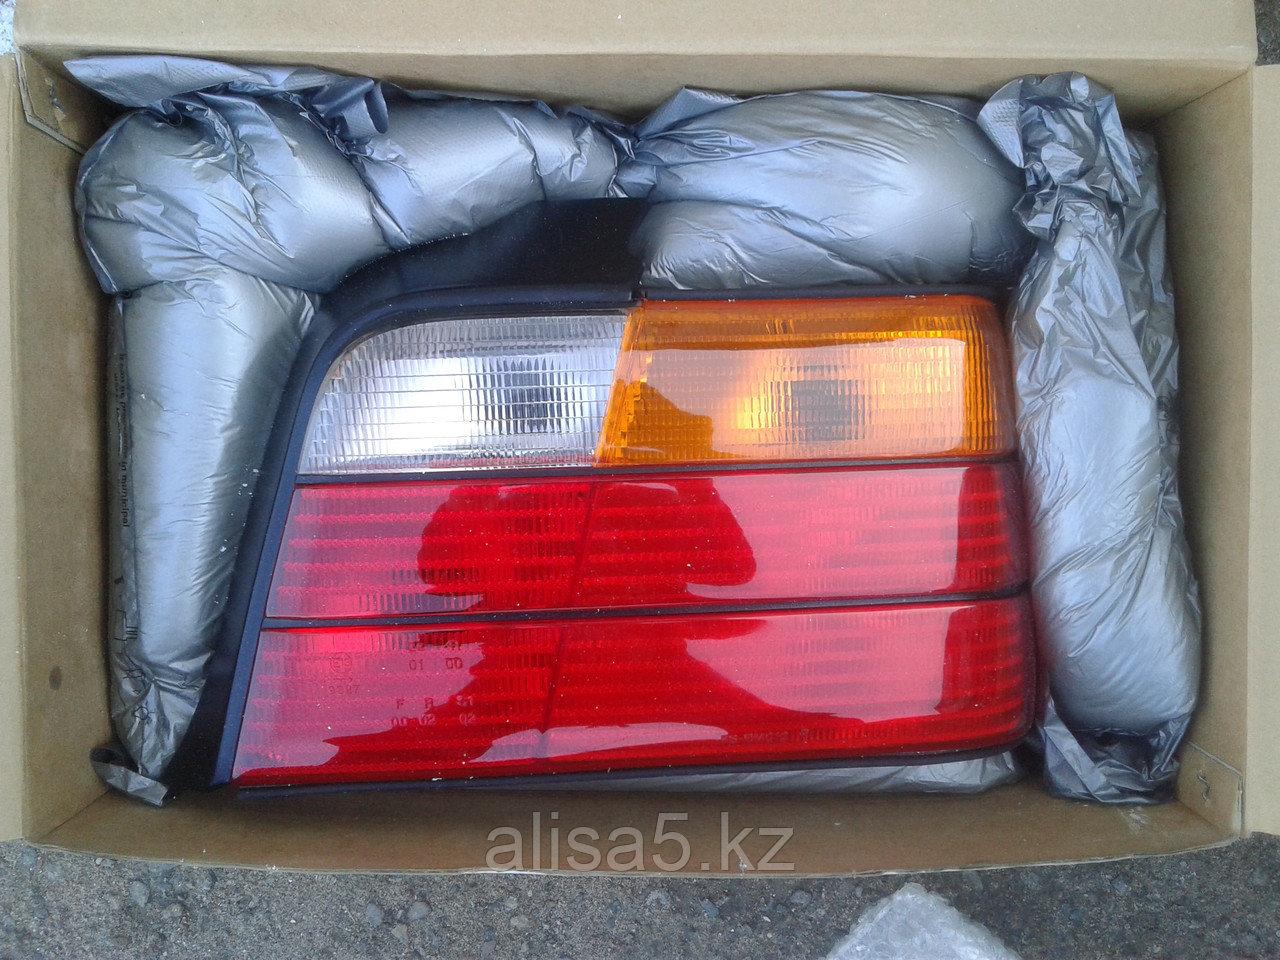 BMW 5 Series (Е-36) 91 г Задний фонарь правый Rh